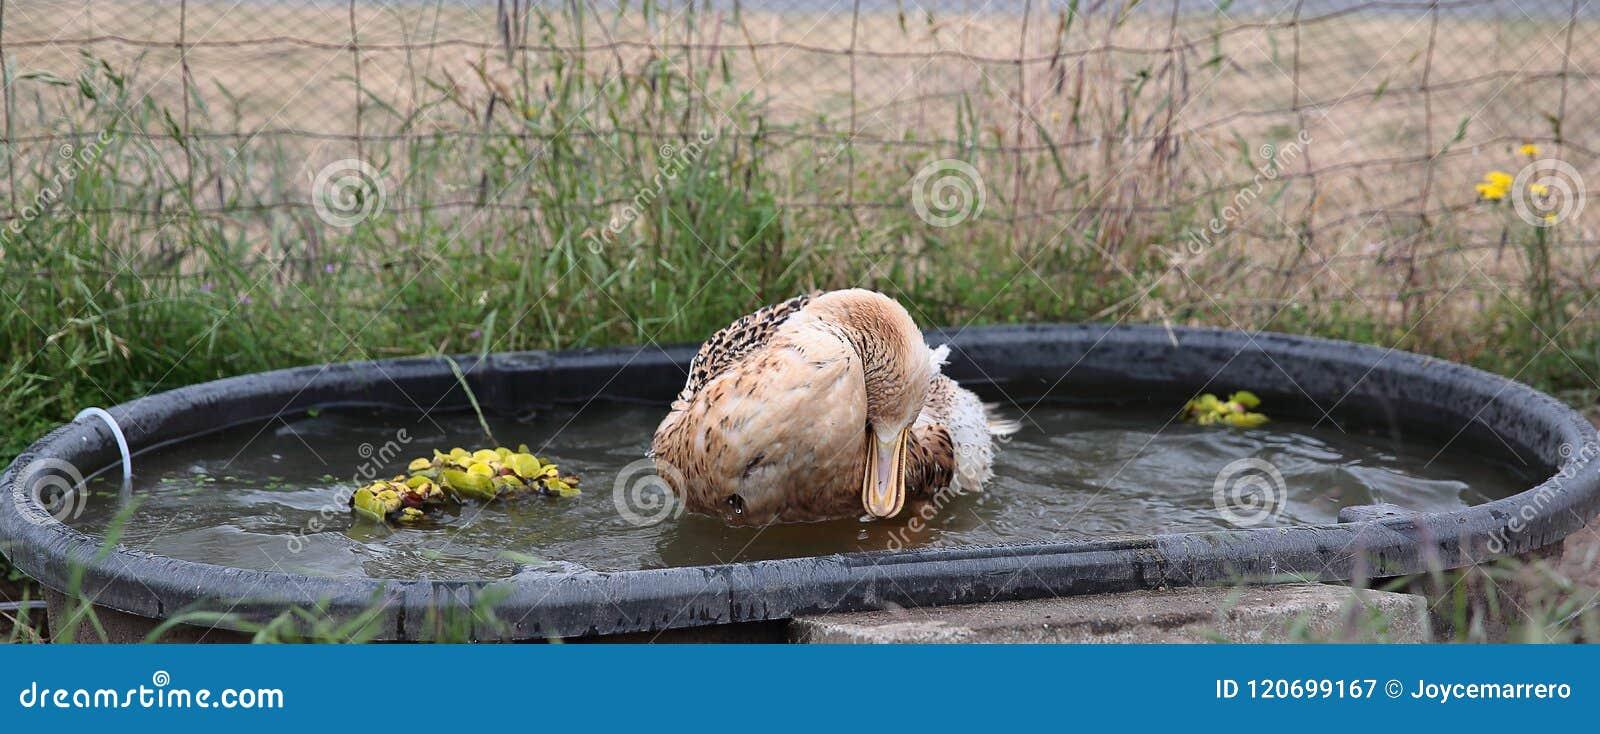 Appleyard Duck Bathing in Ton